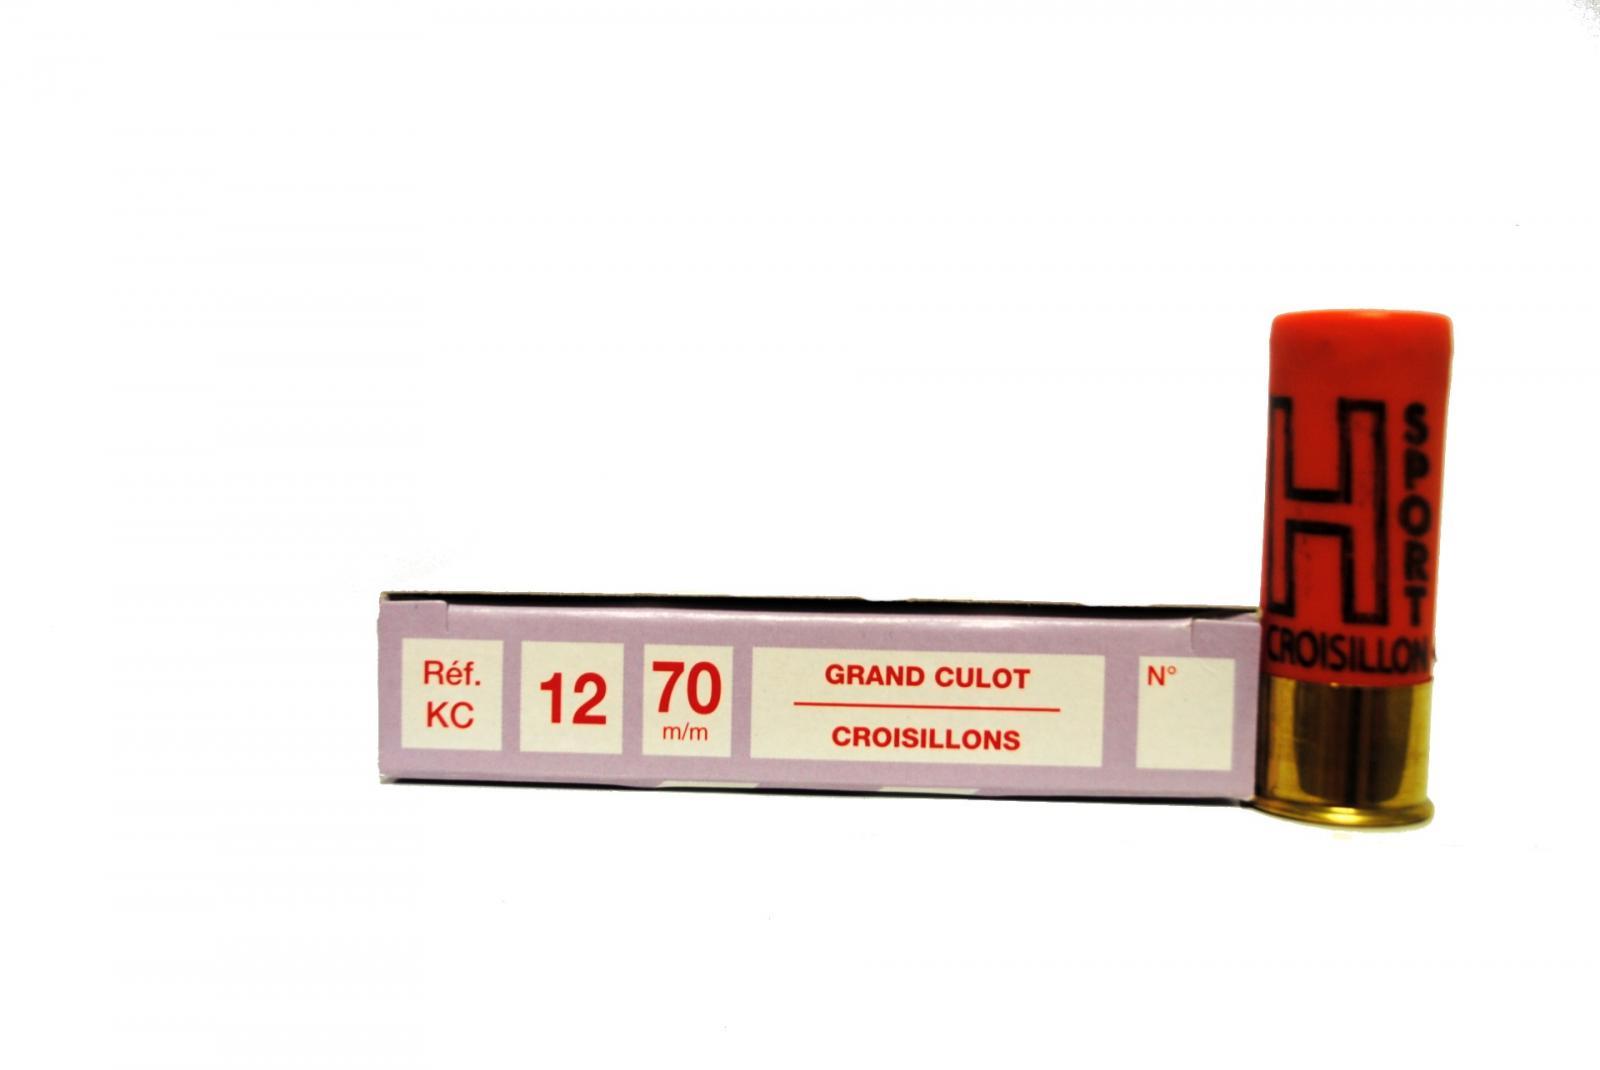 Boite de 10 cartouches 12 / 70 grand culot CROISILLON KC1